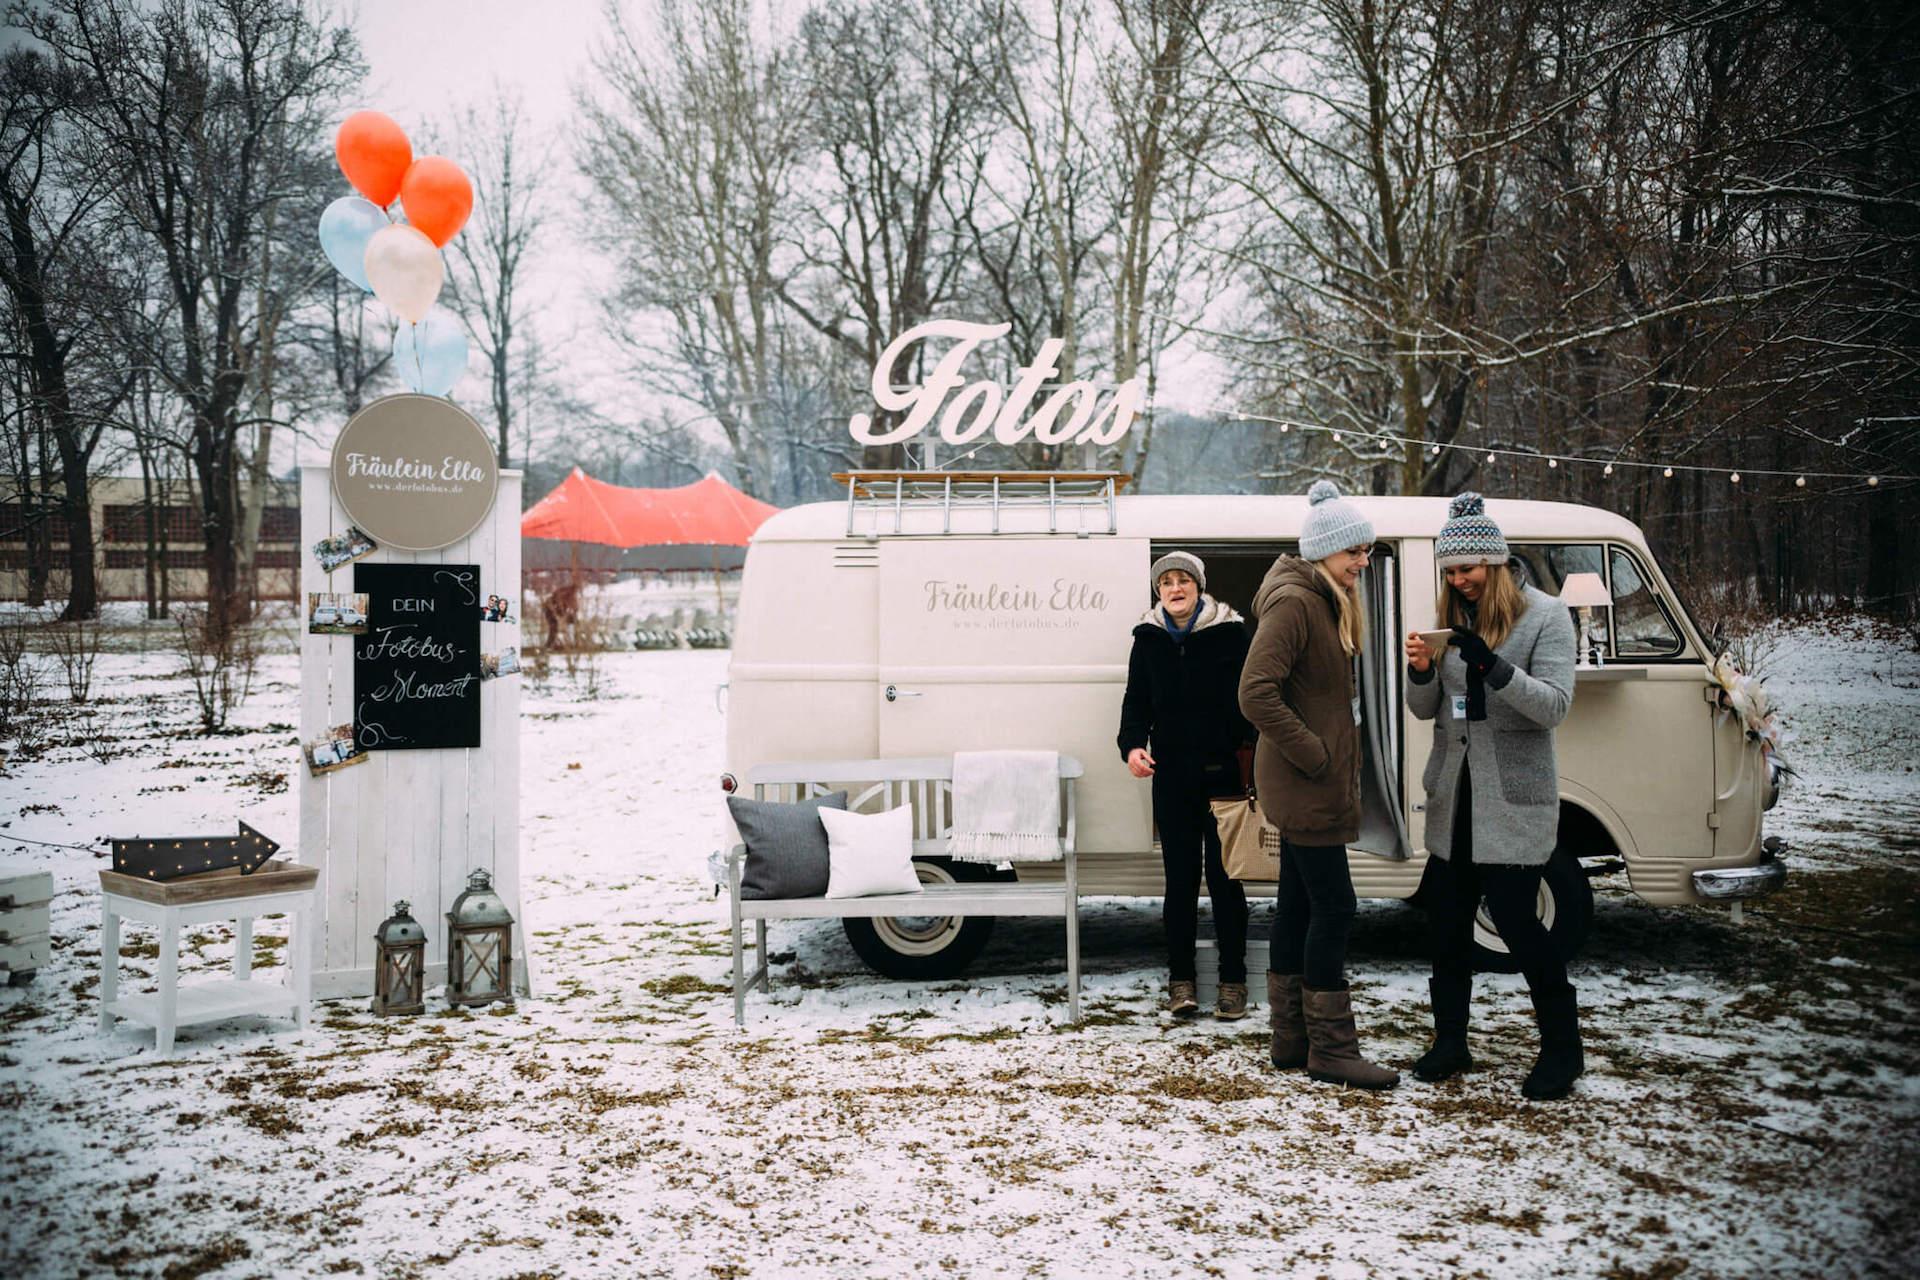 Wedding Market Winter Edition 2017 (c) Robert Strehler